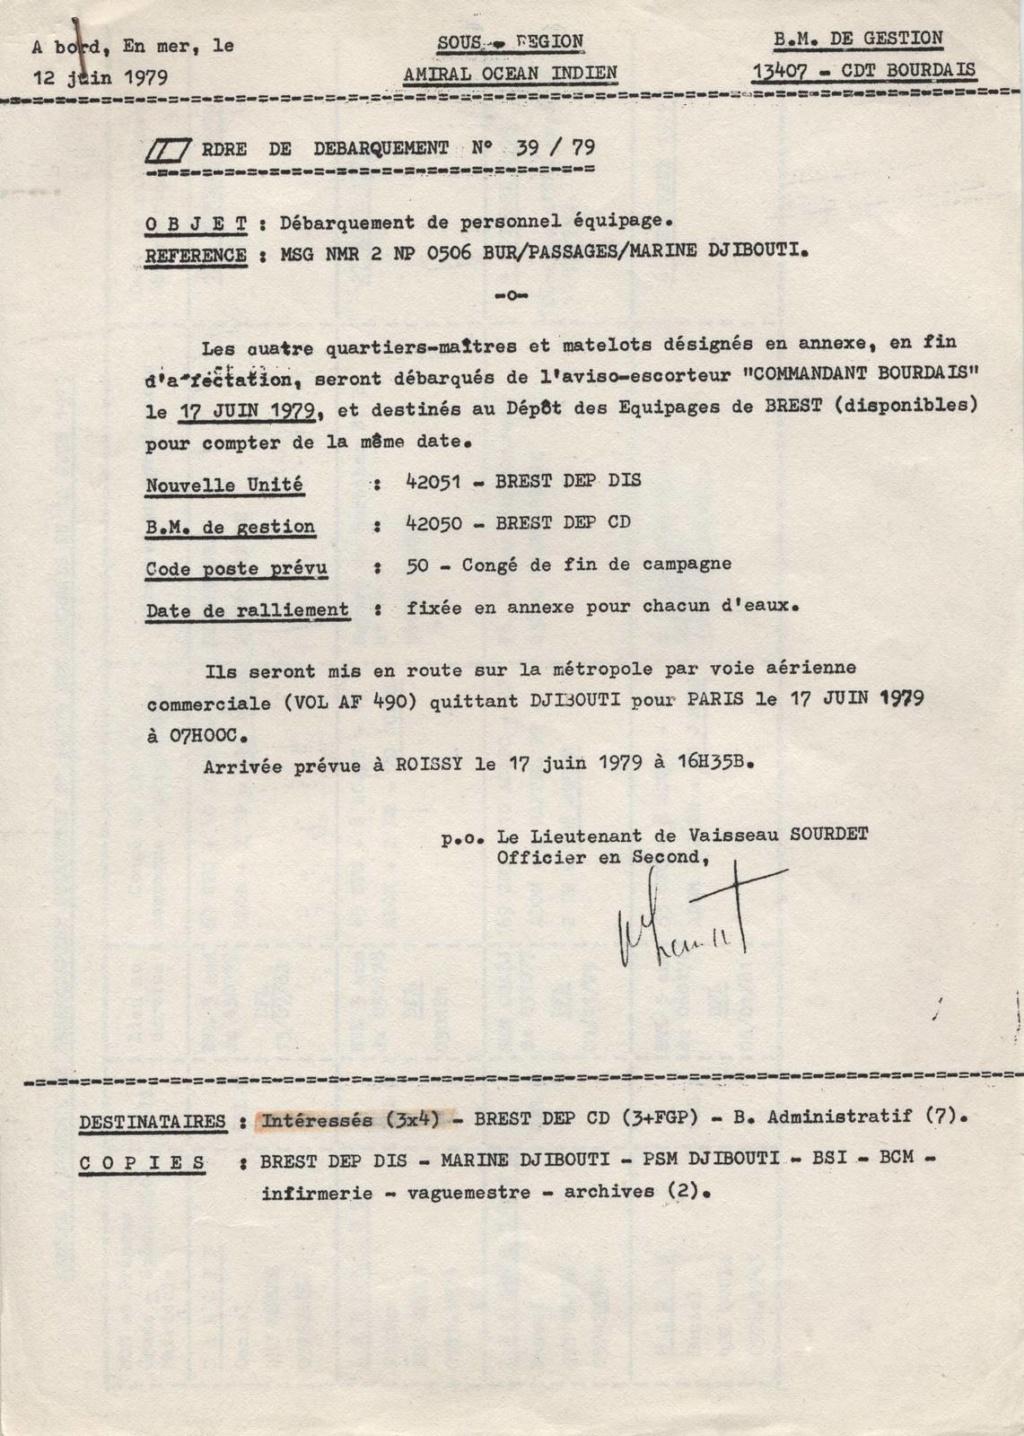 CDT BOURDAIS (AE) Tome 3 - Page 6 Ordre_10